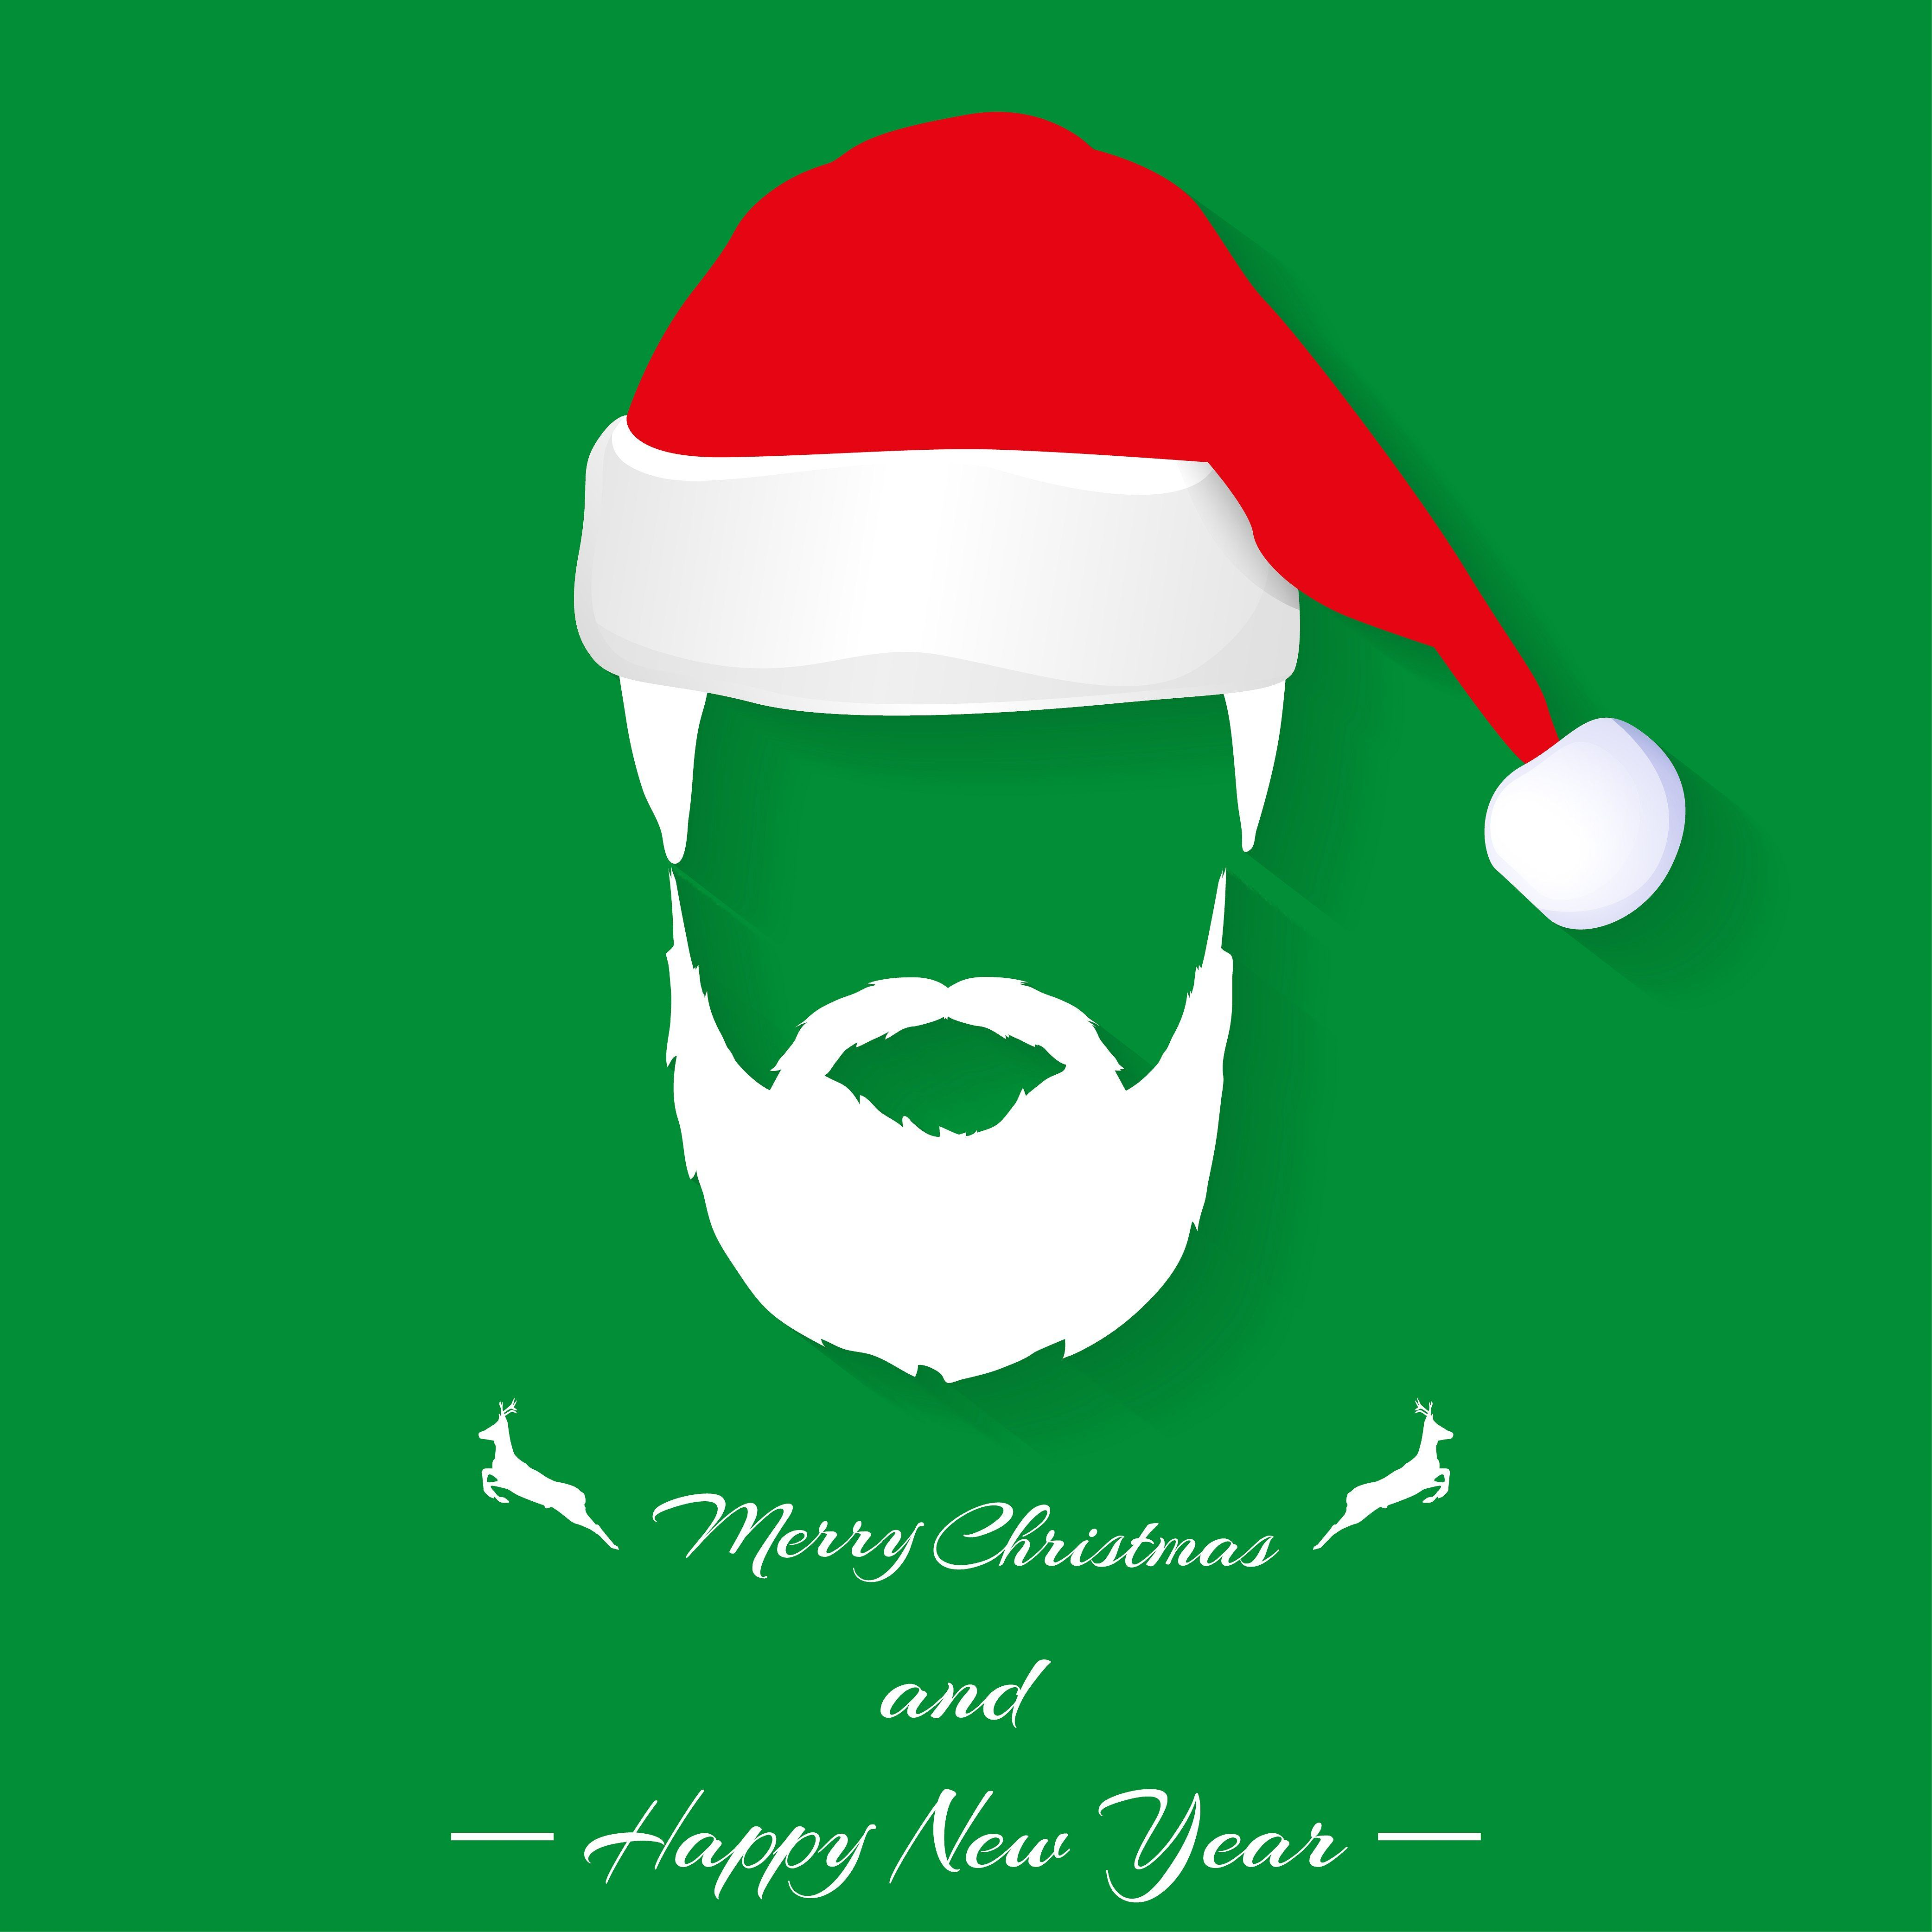 Santa Hat And Beard Illustrations Creative Market